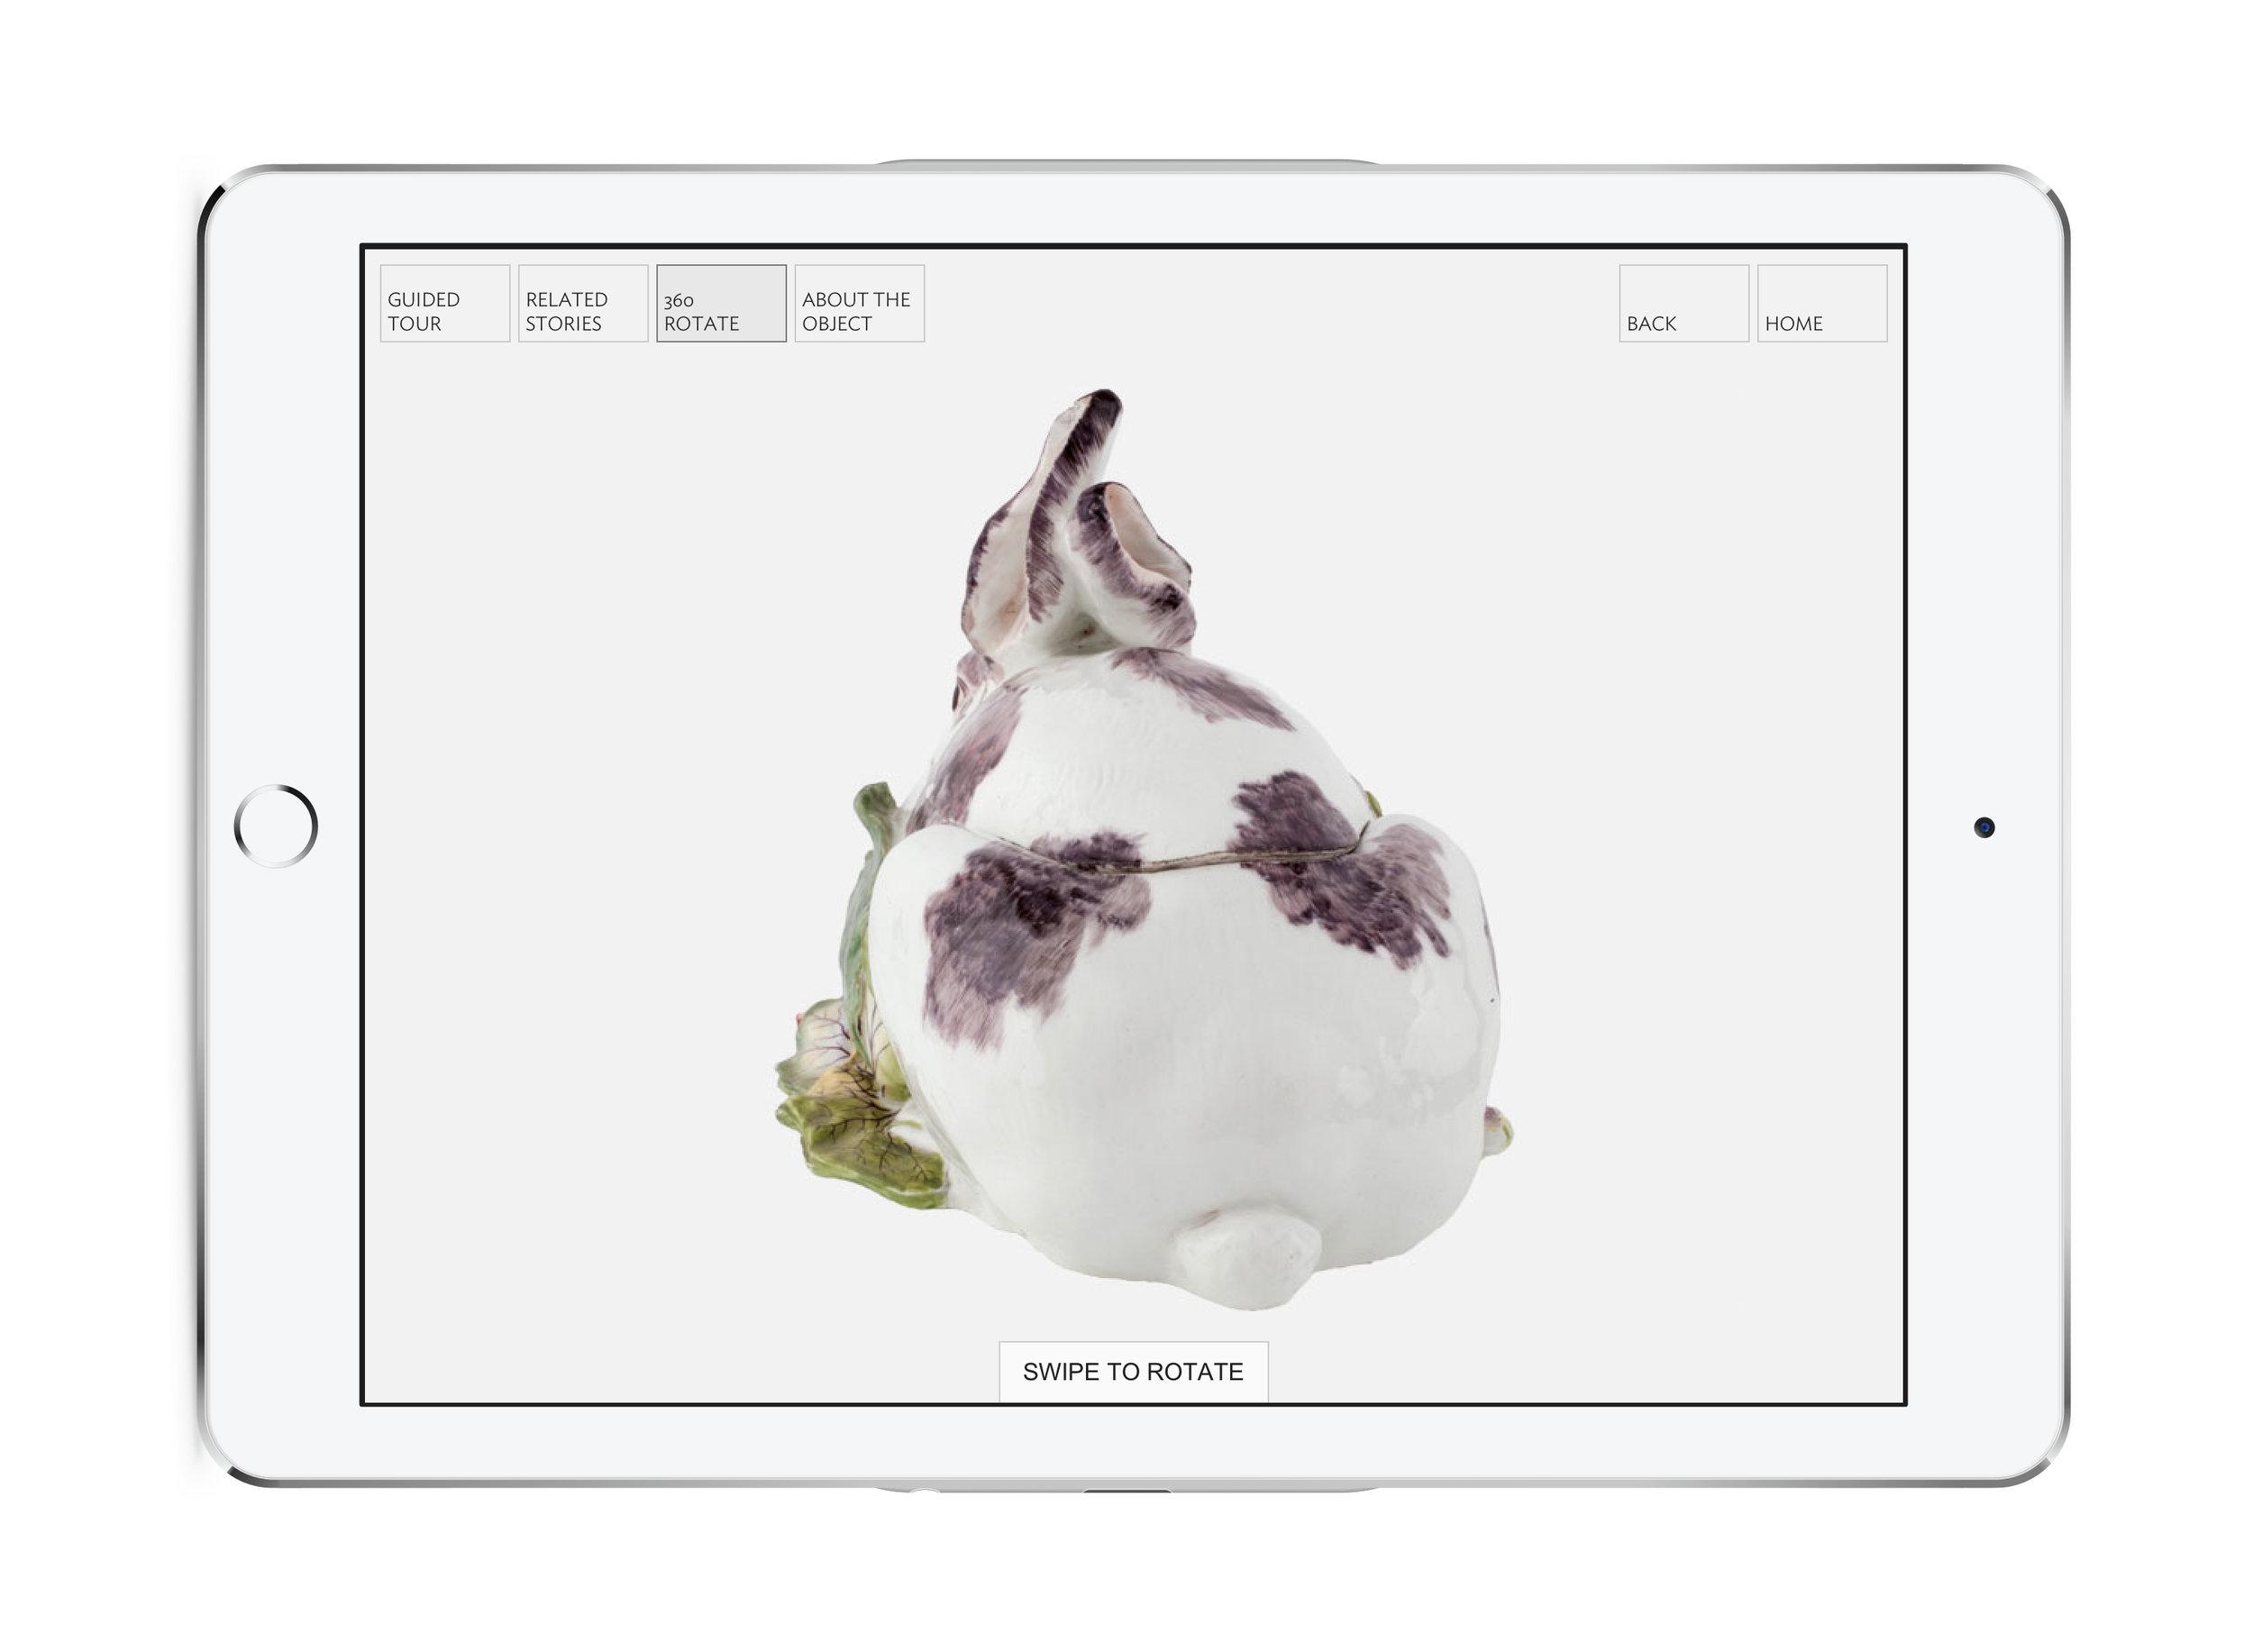 7aic-iPad-360rotate.jpg